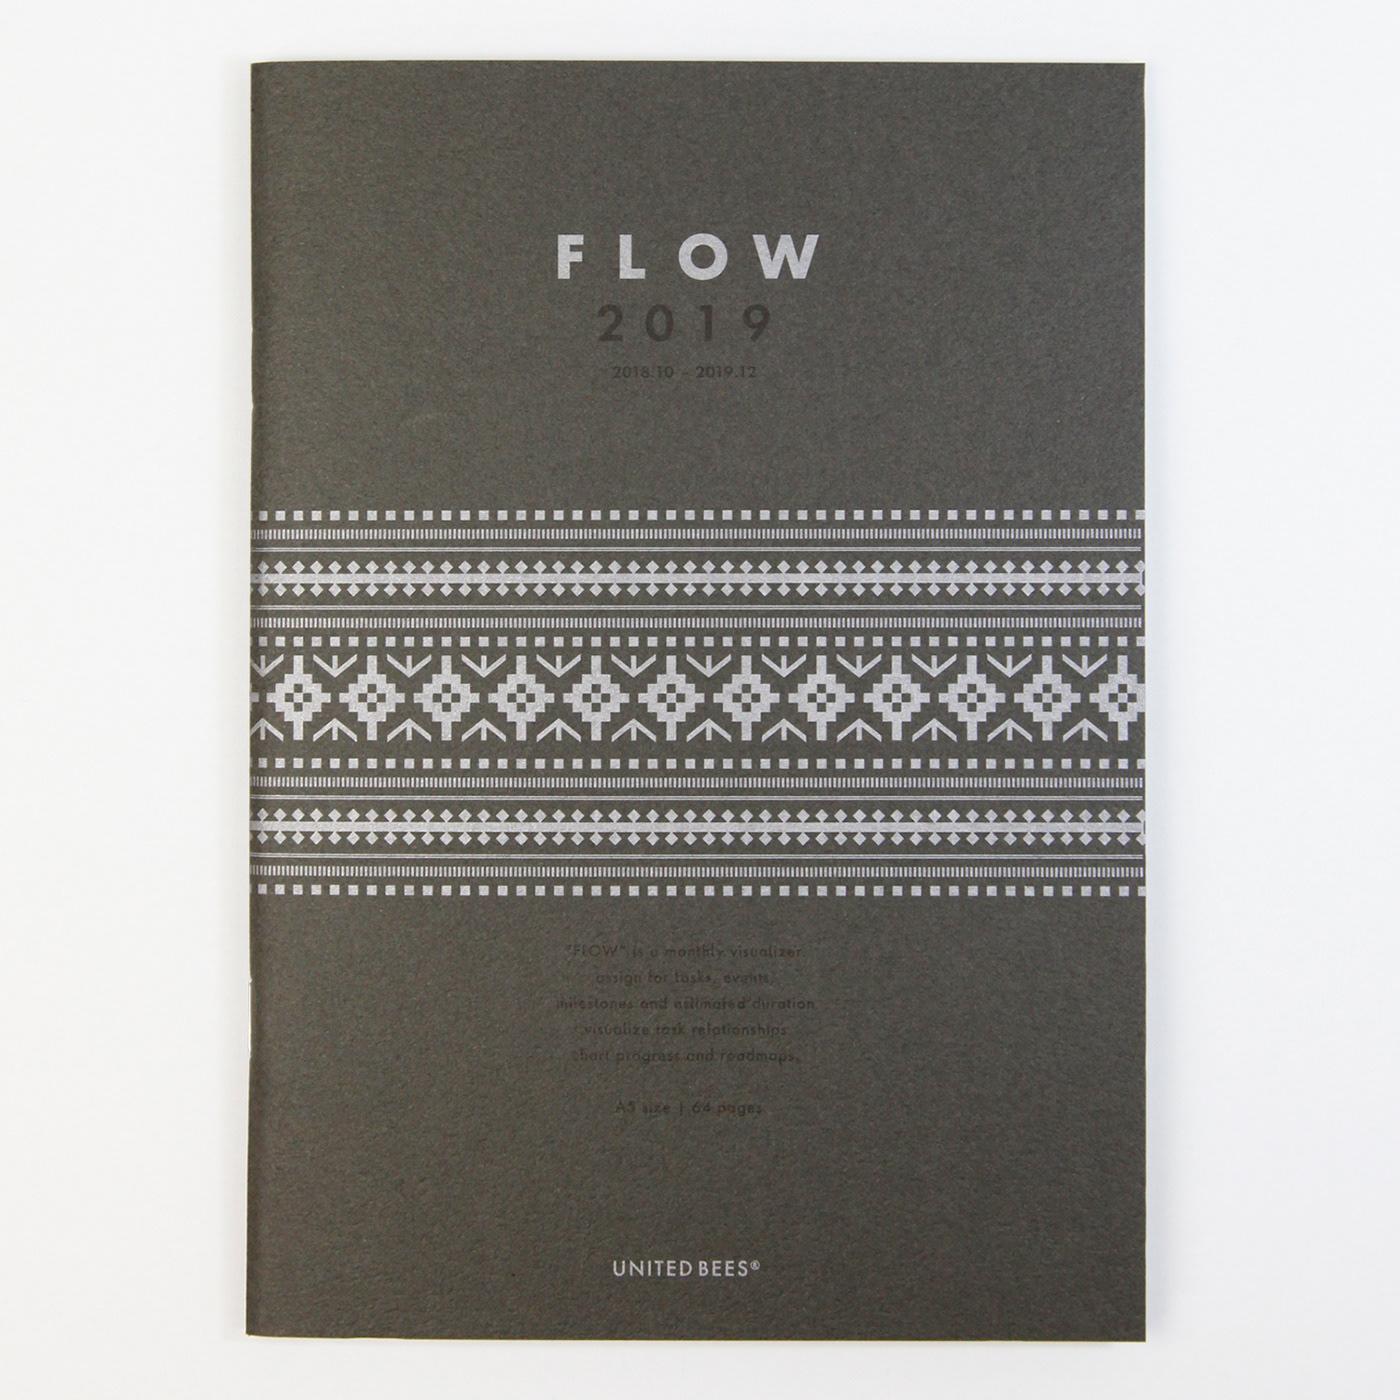 Gantt Chart Canva flow diary ui on pantone canvas gallery